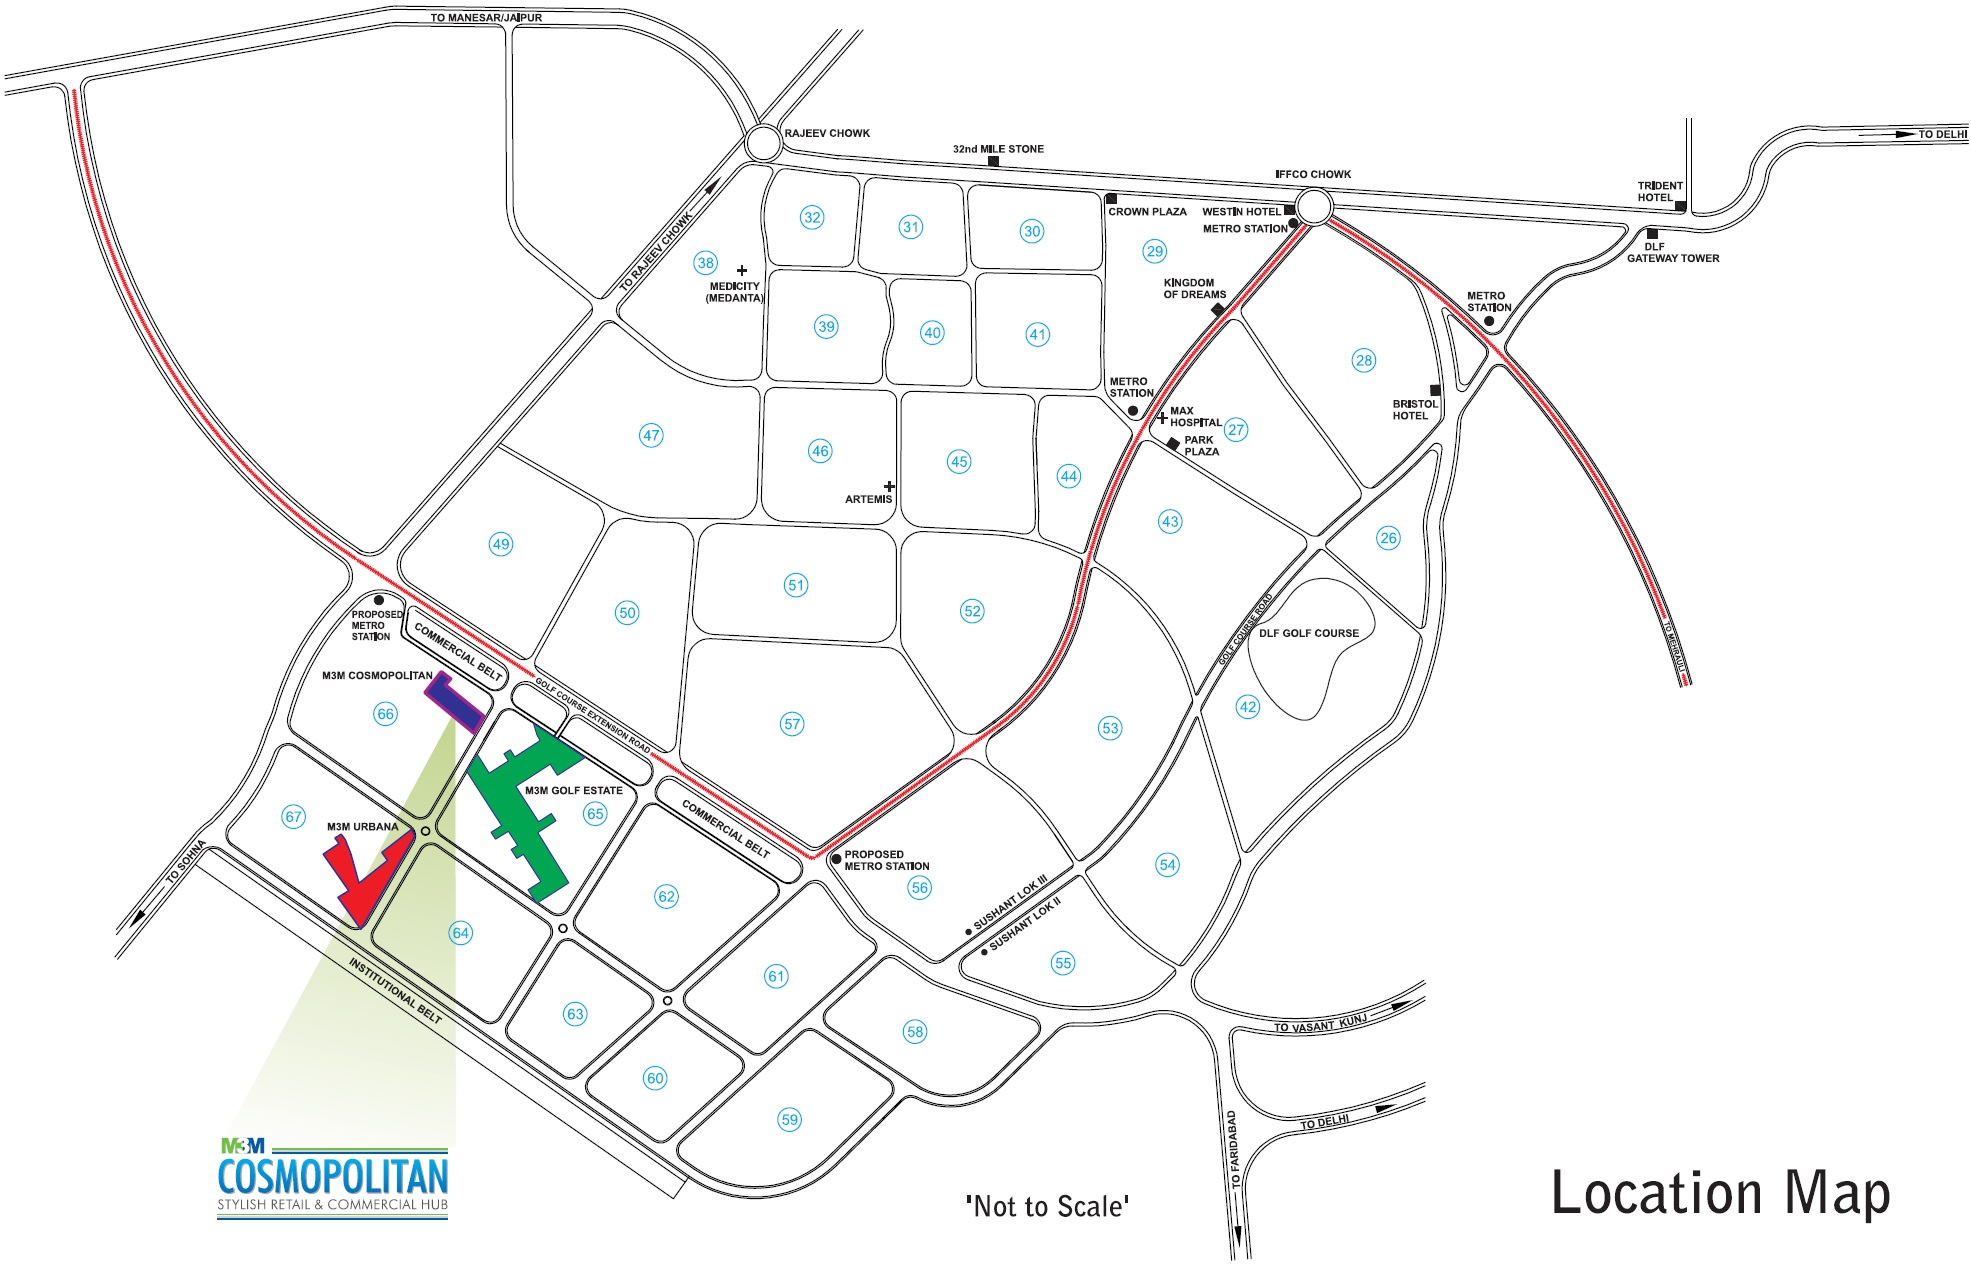 m3m-cosmopolitan-location-map